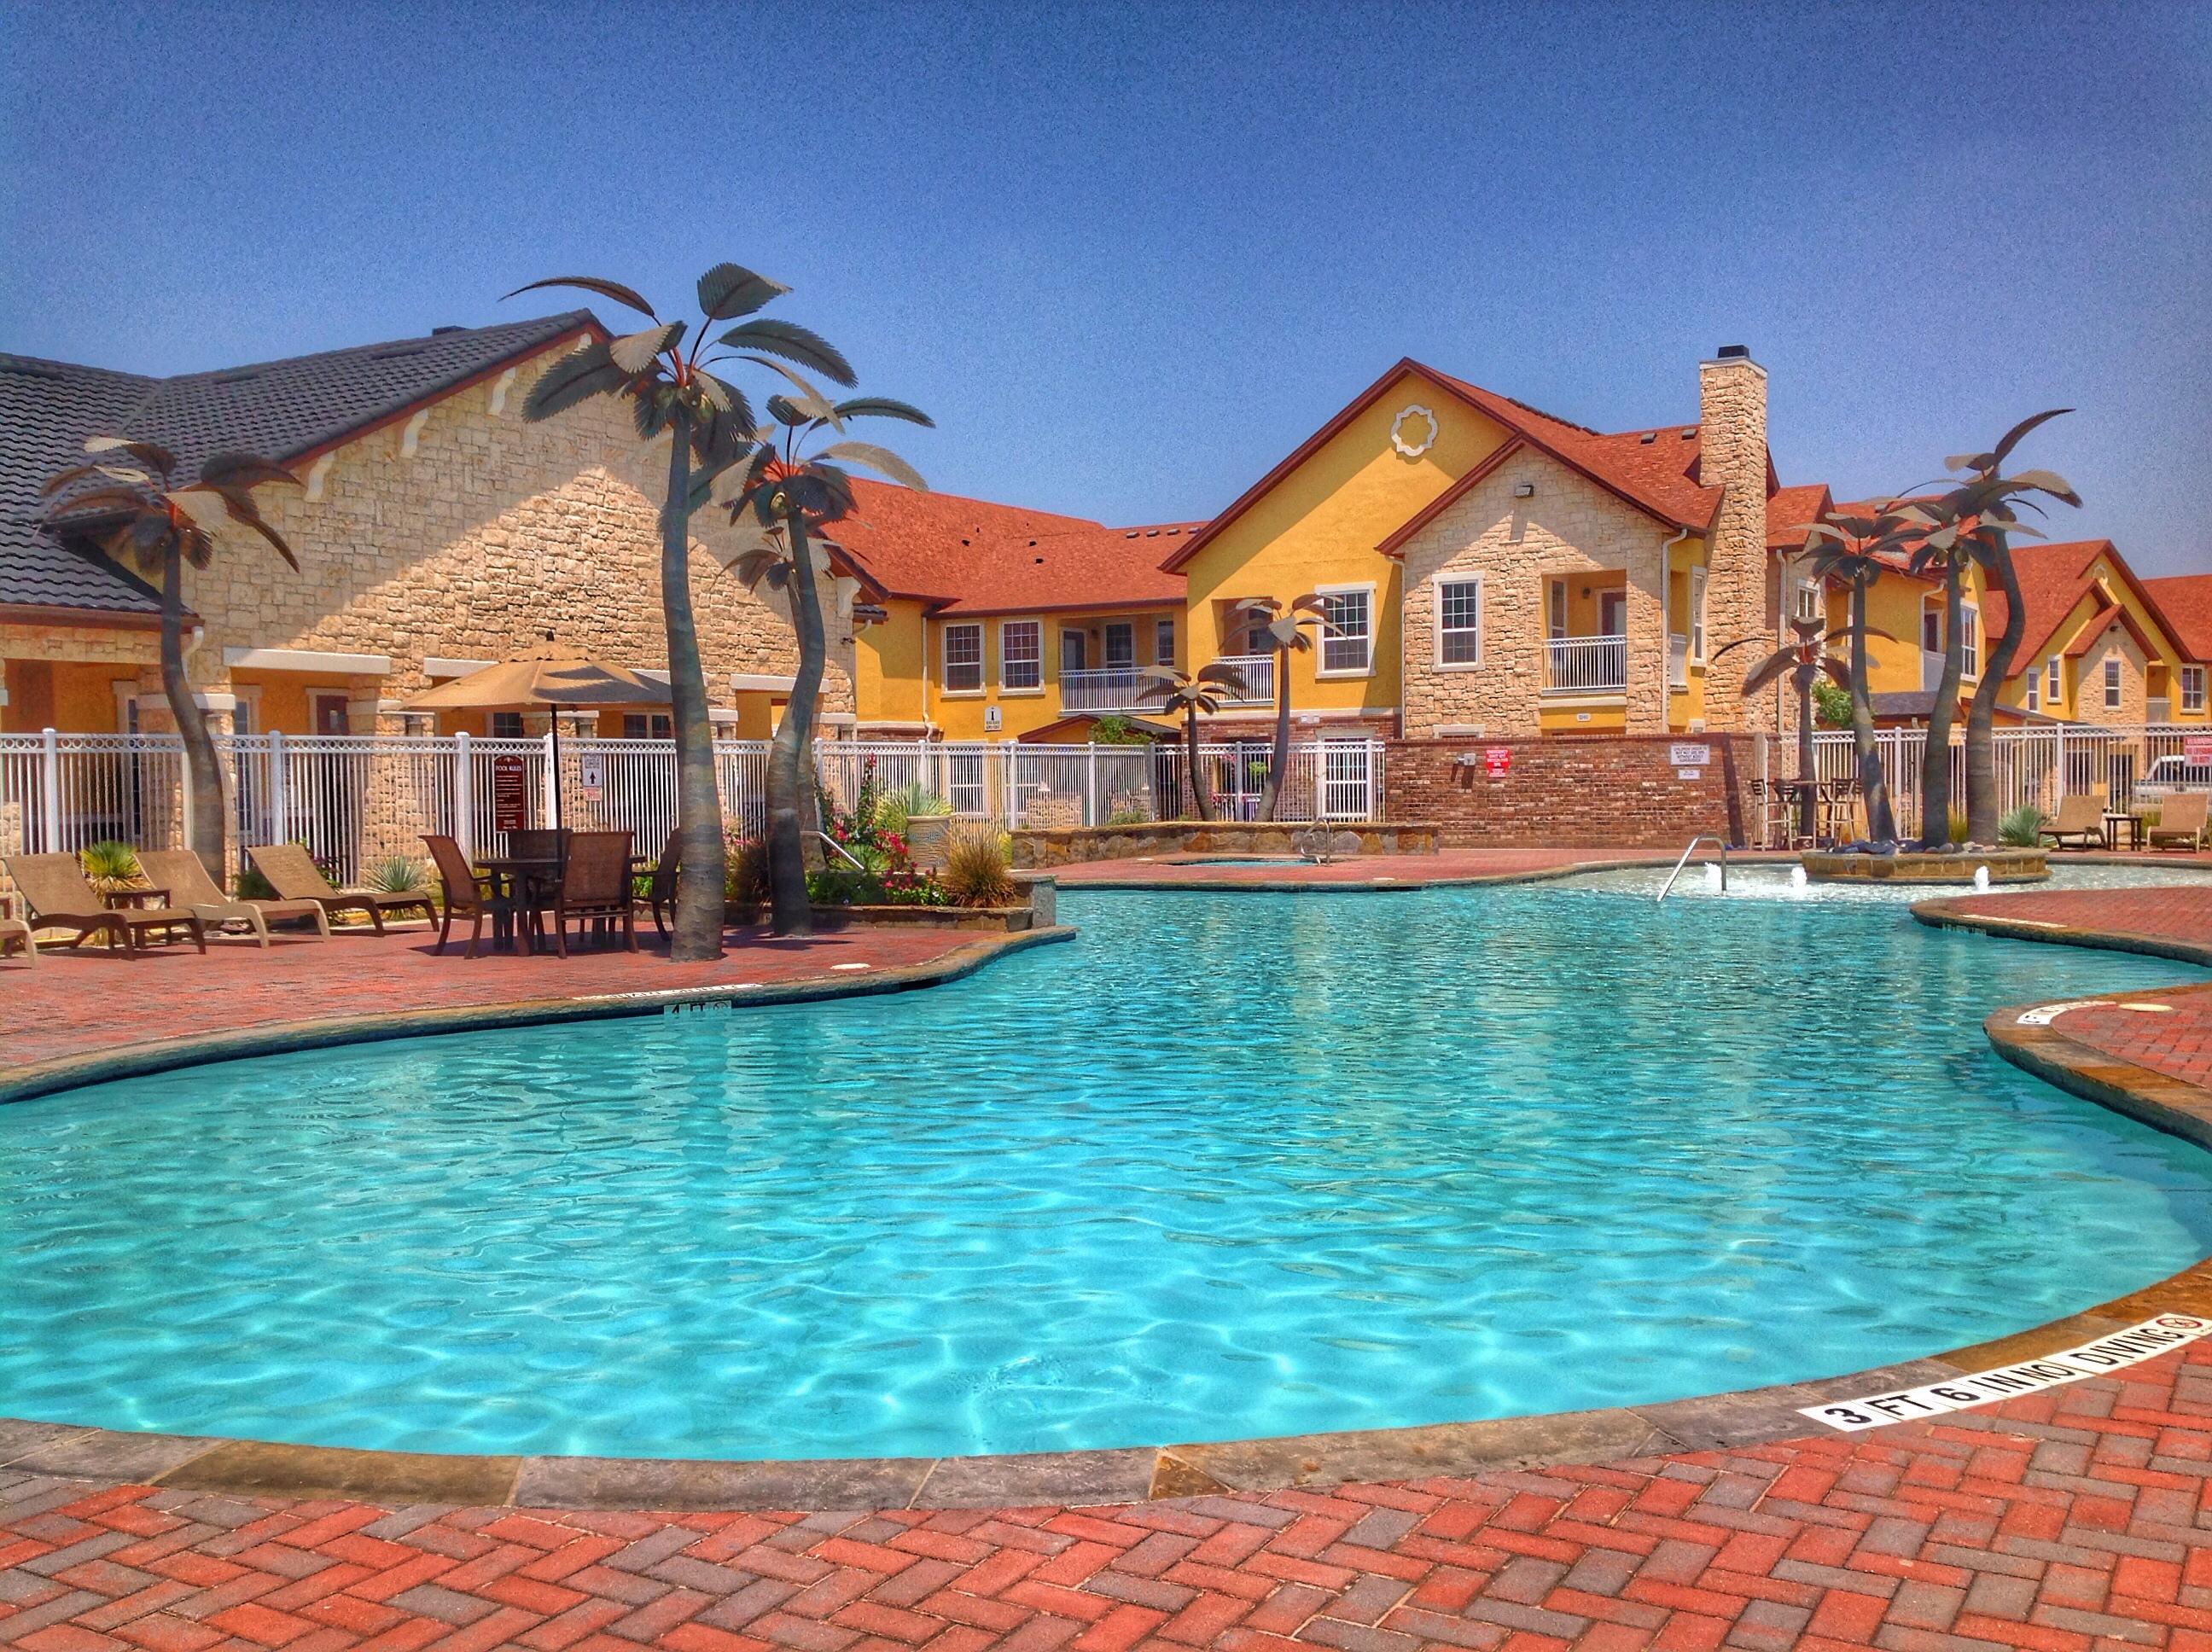 Multifamily Paradise Living At Lantana Gardens In Odessa Water Works Of Texas Corpus Christi Tx